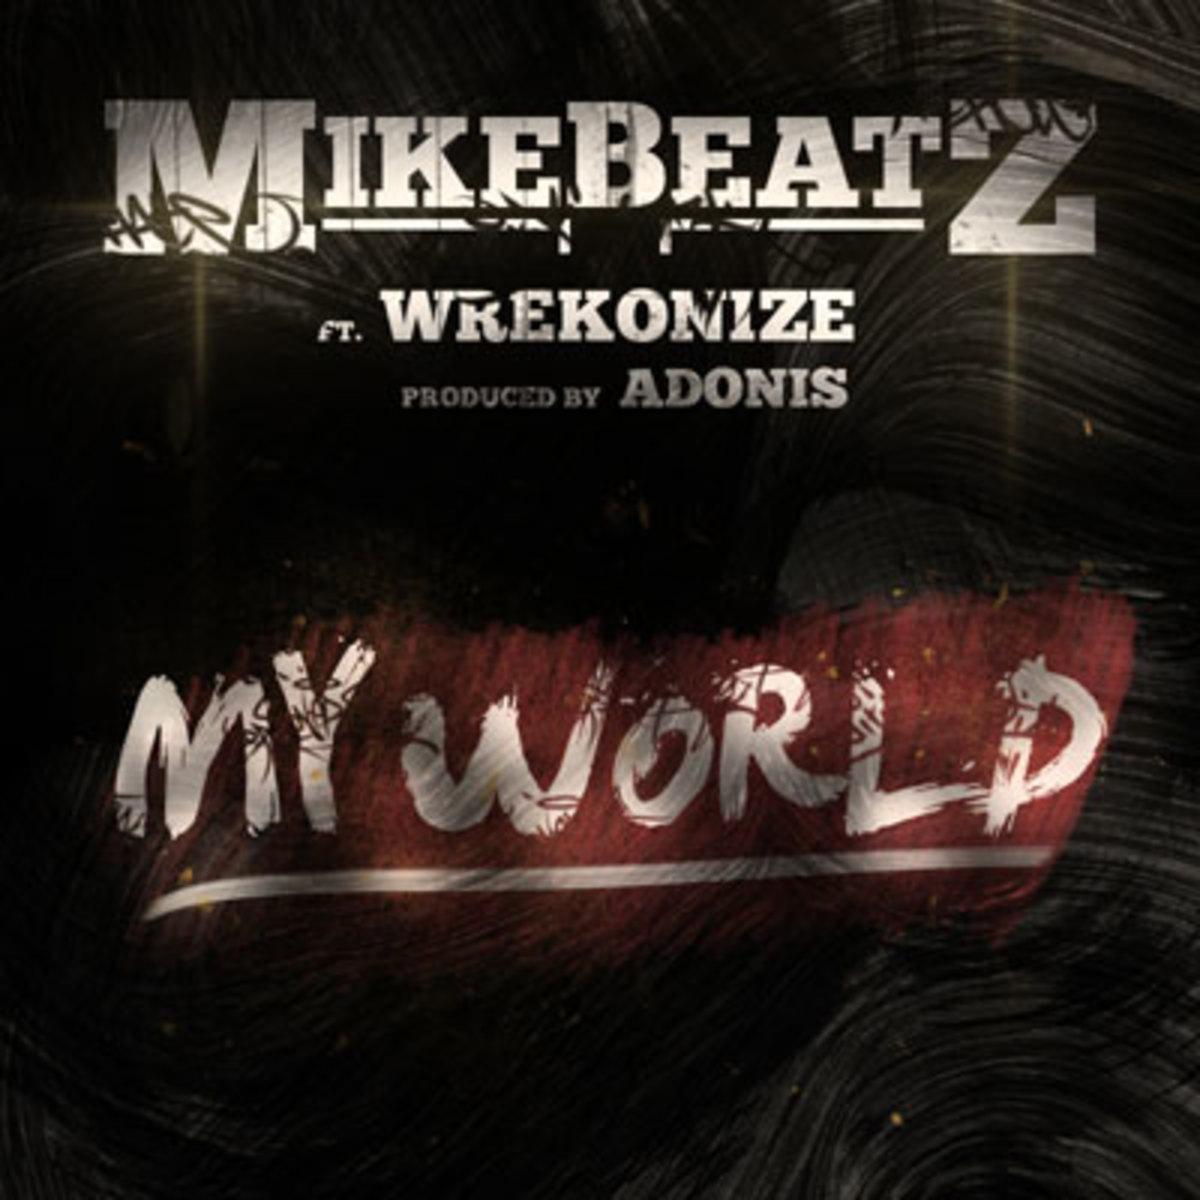 mikebeatz-myworld.jpg